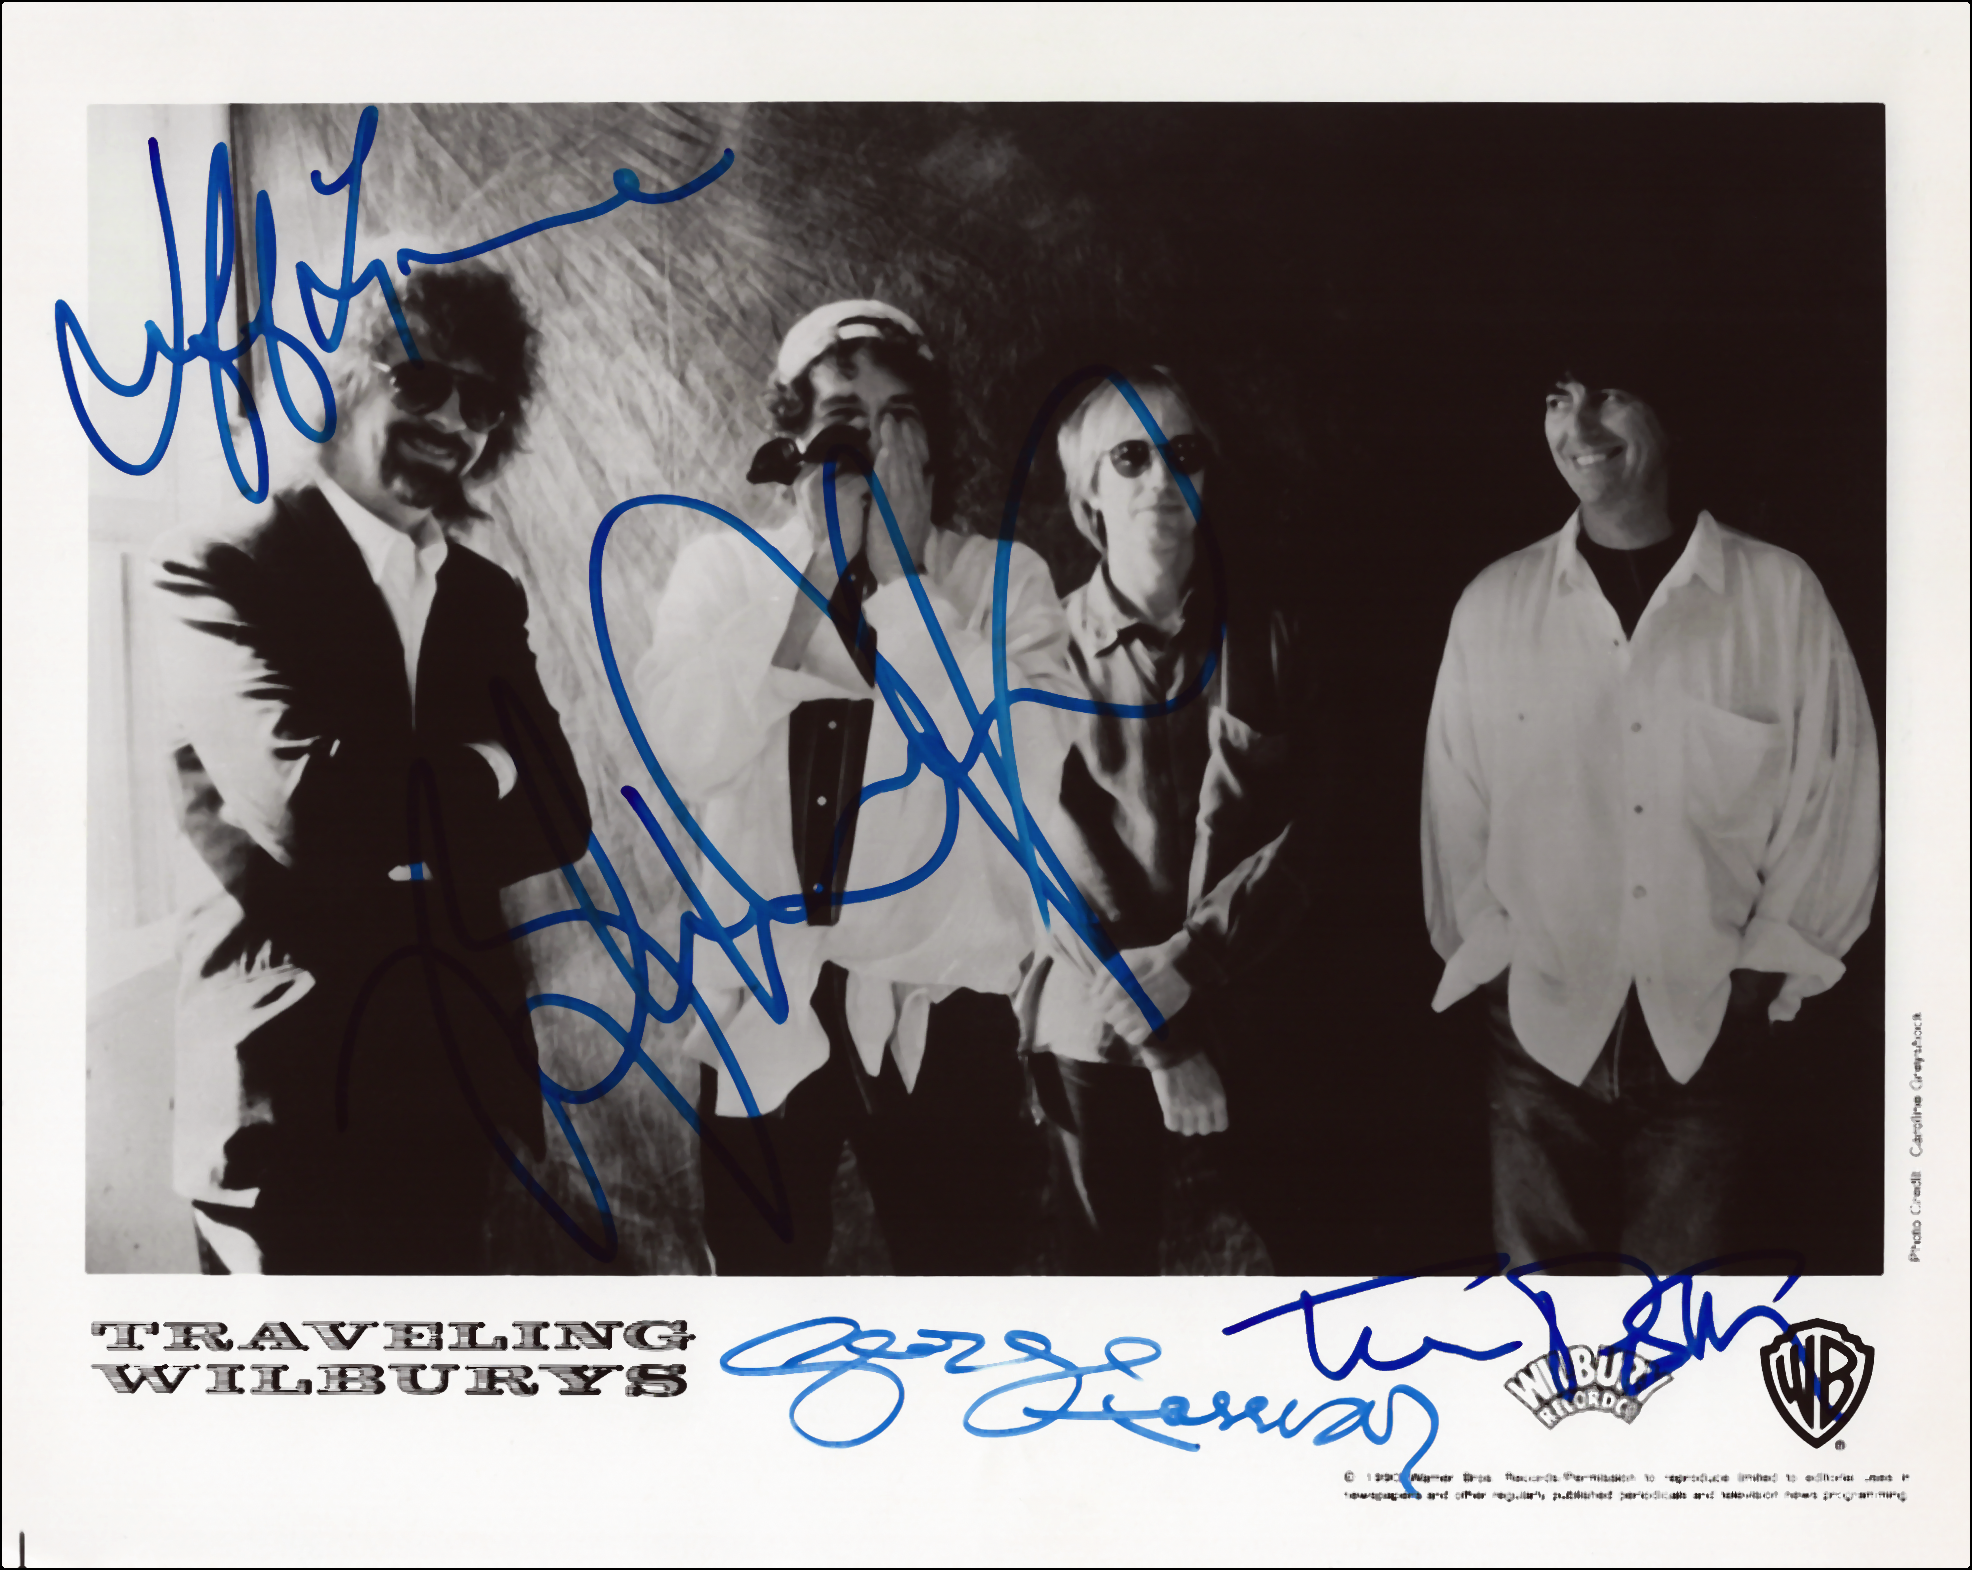 Photo - George Harrison - Traveling Wilburys